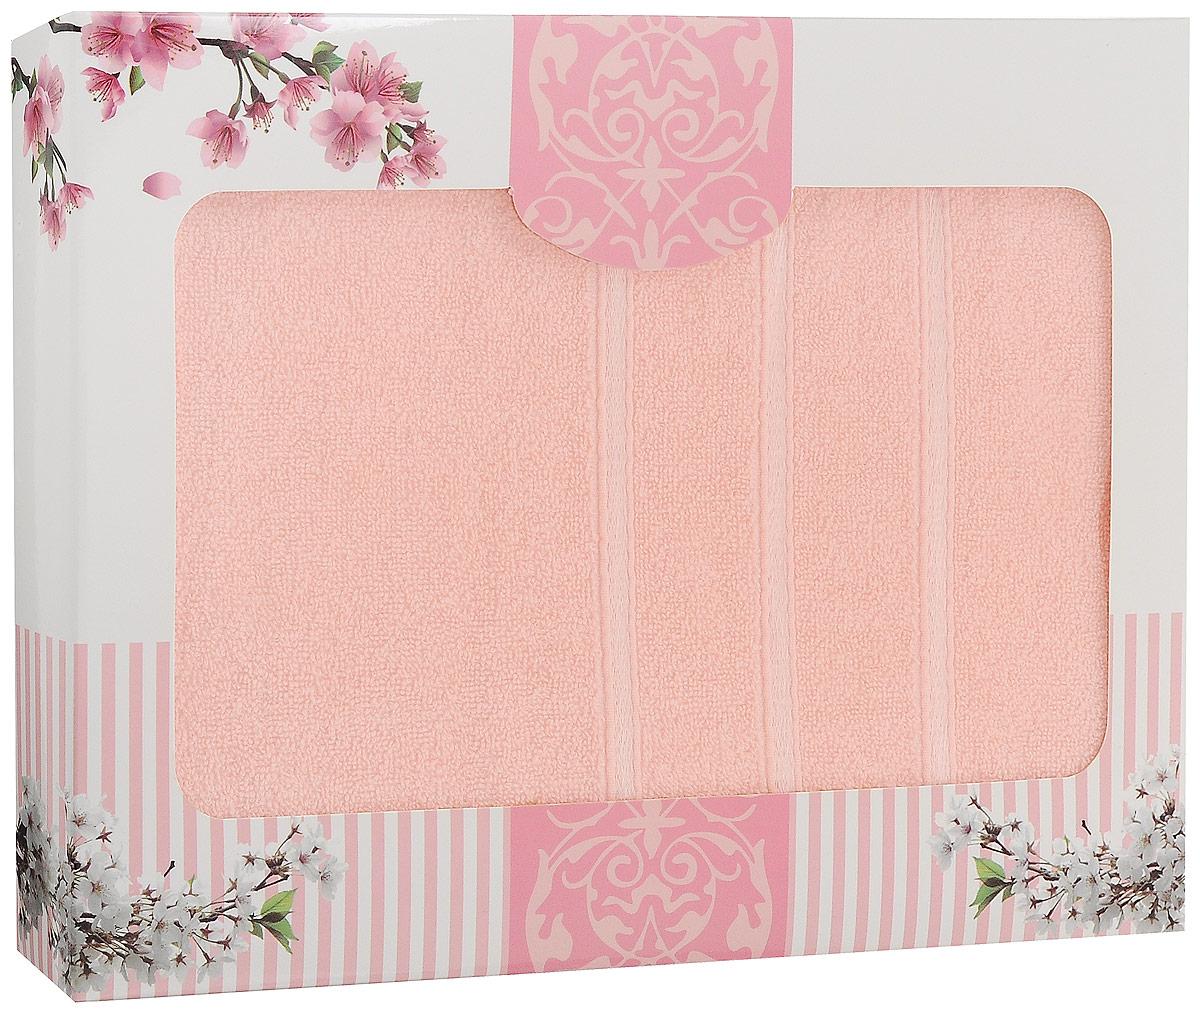 "Полотенце хлопковое ""Home Textile"", цвет: персиковый, 70 х 140 см"